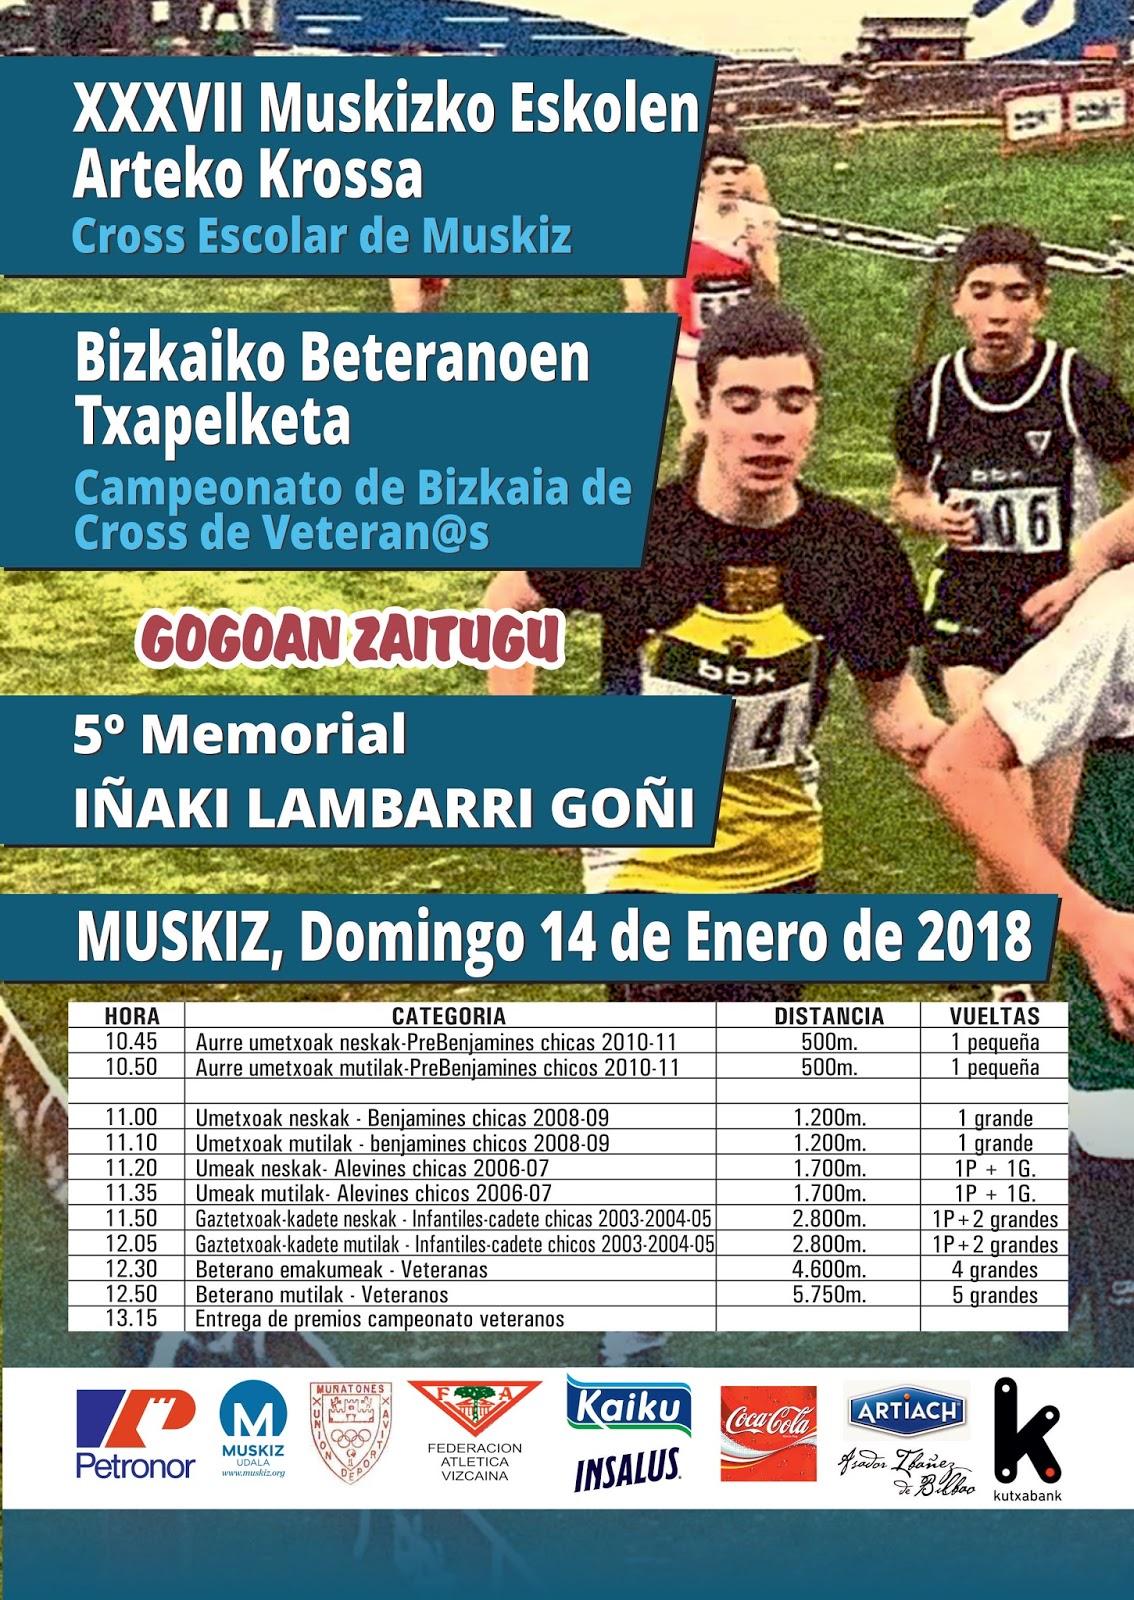 2019 01 14 Muskiz